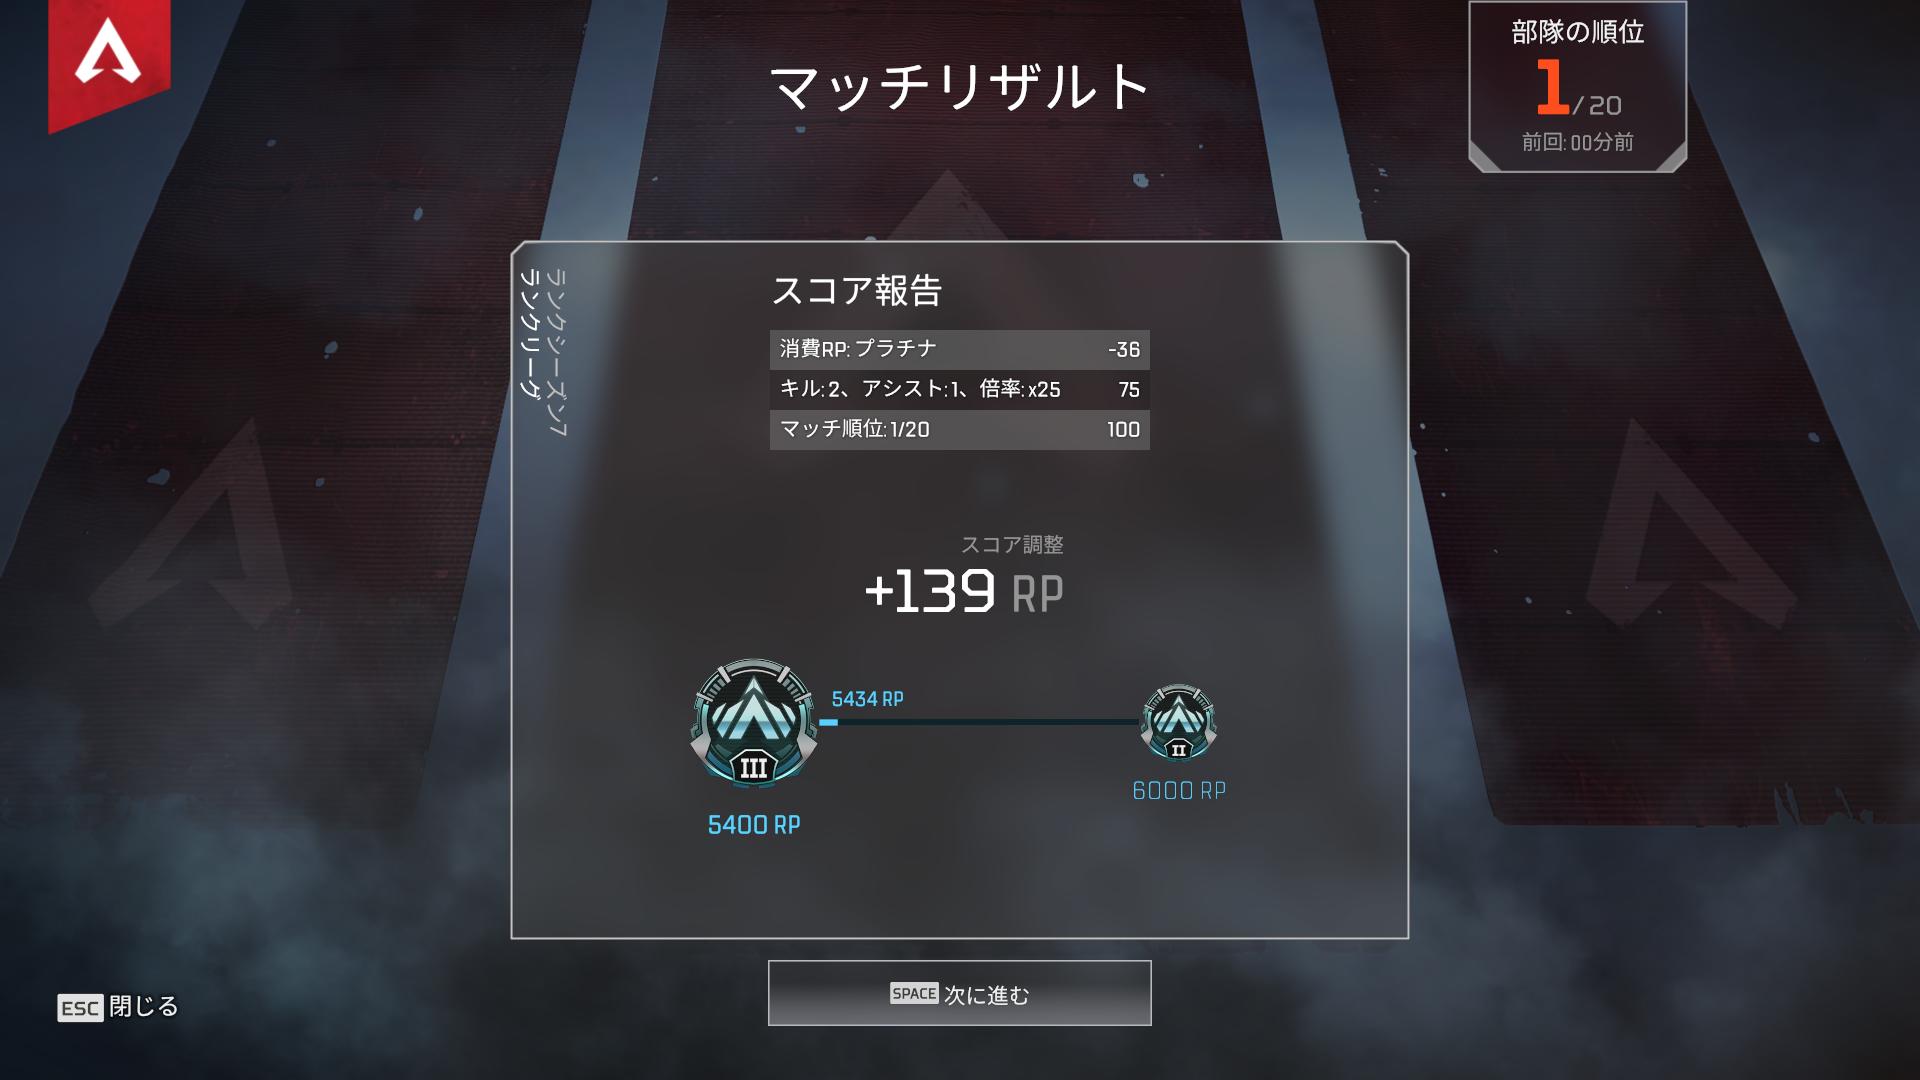 f:id:kyoumoe:20210119054624p:plain